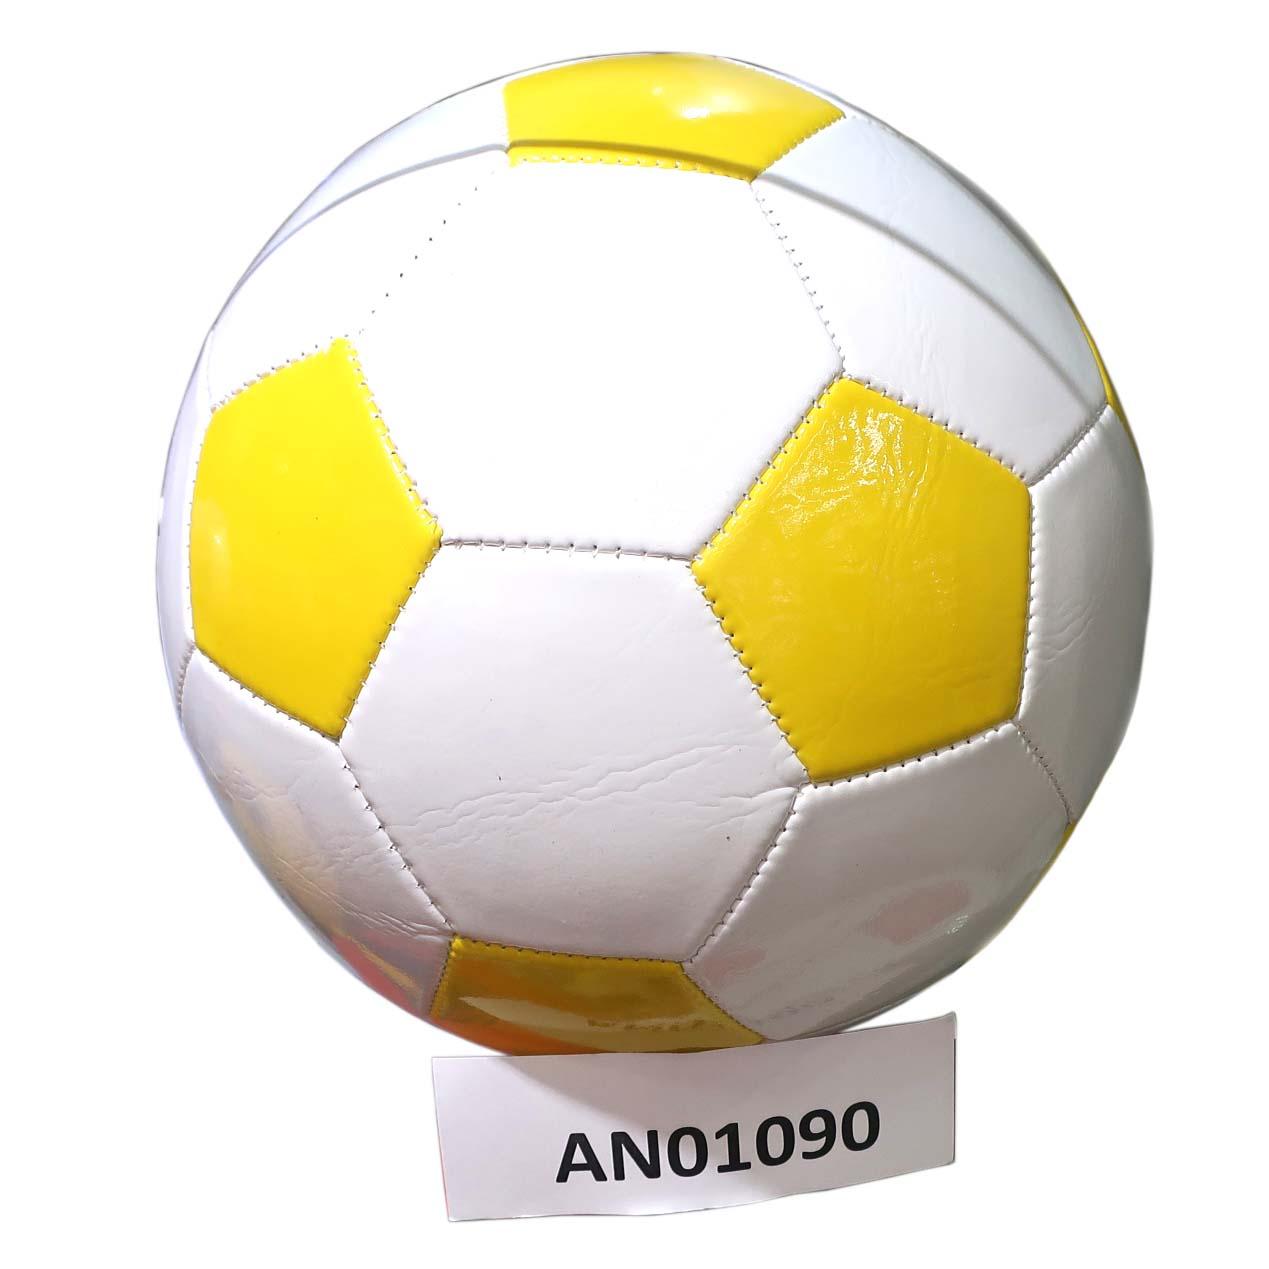 Мяч футбольный ПВХ (240гр) (5 размер), цвет mix Арт. AN01090